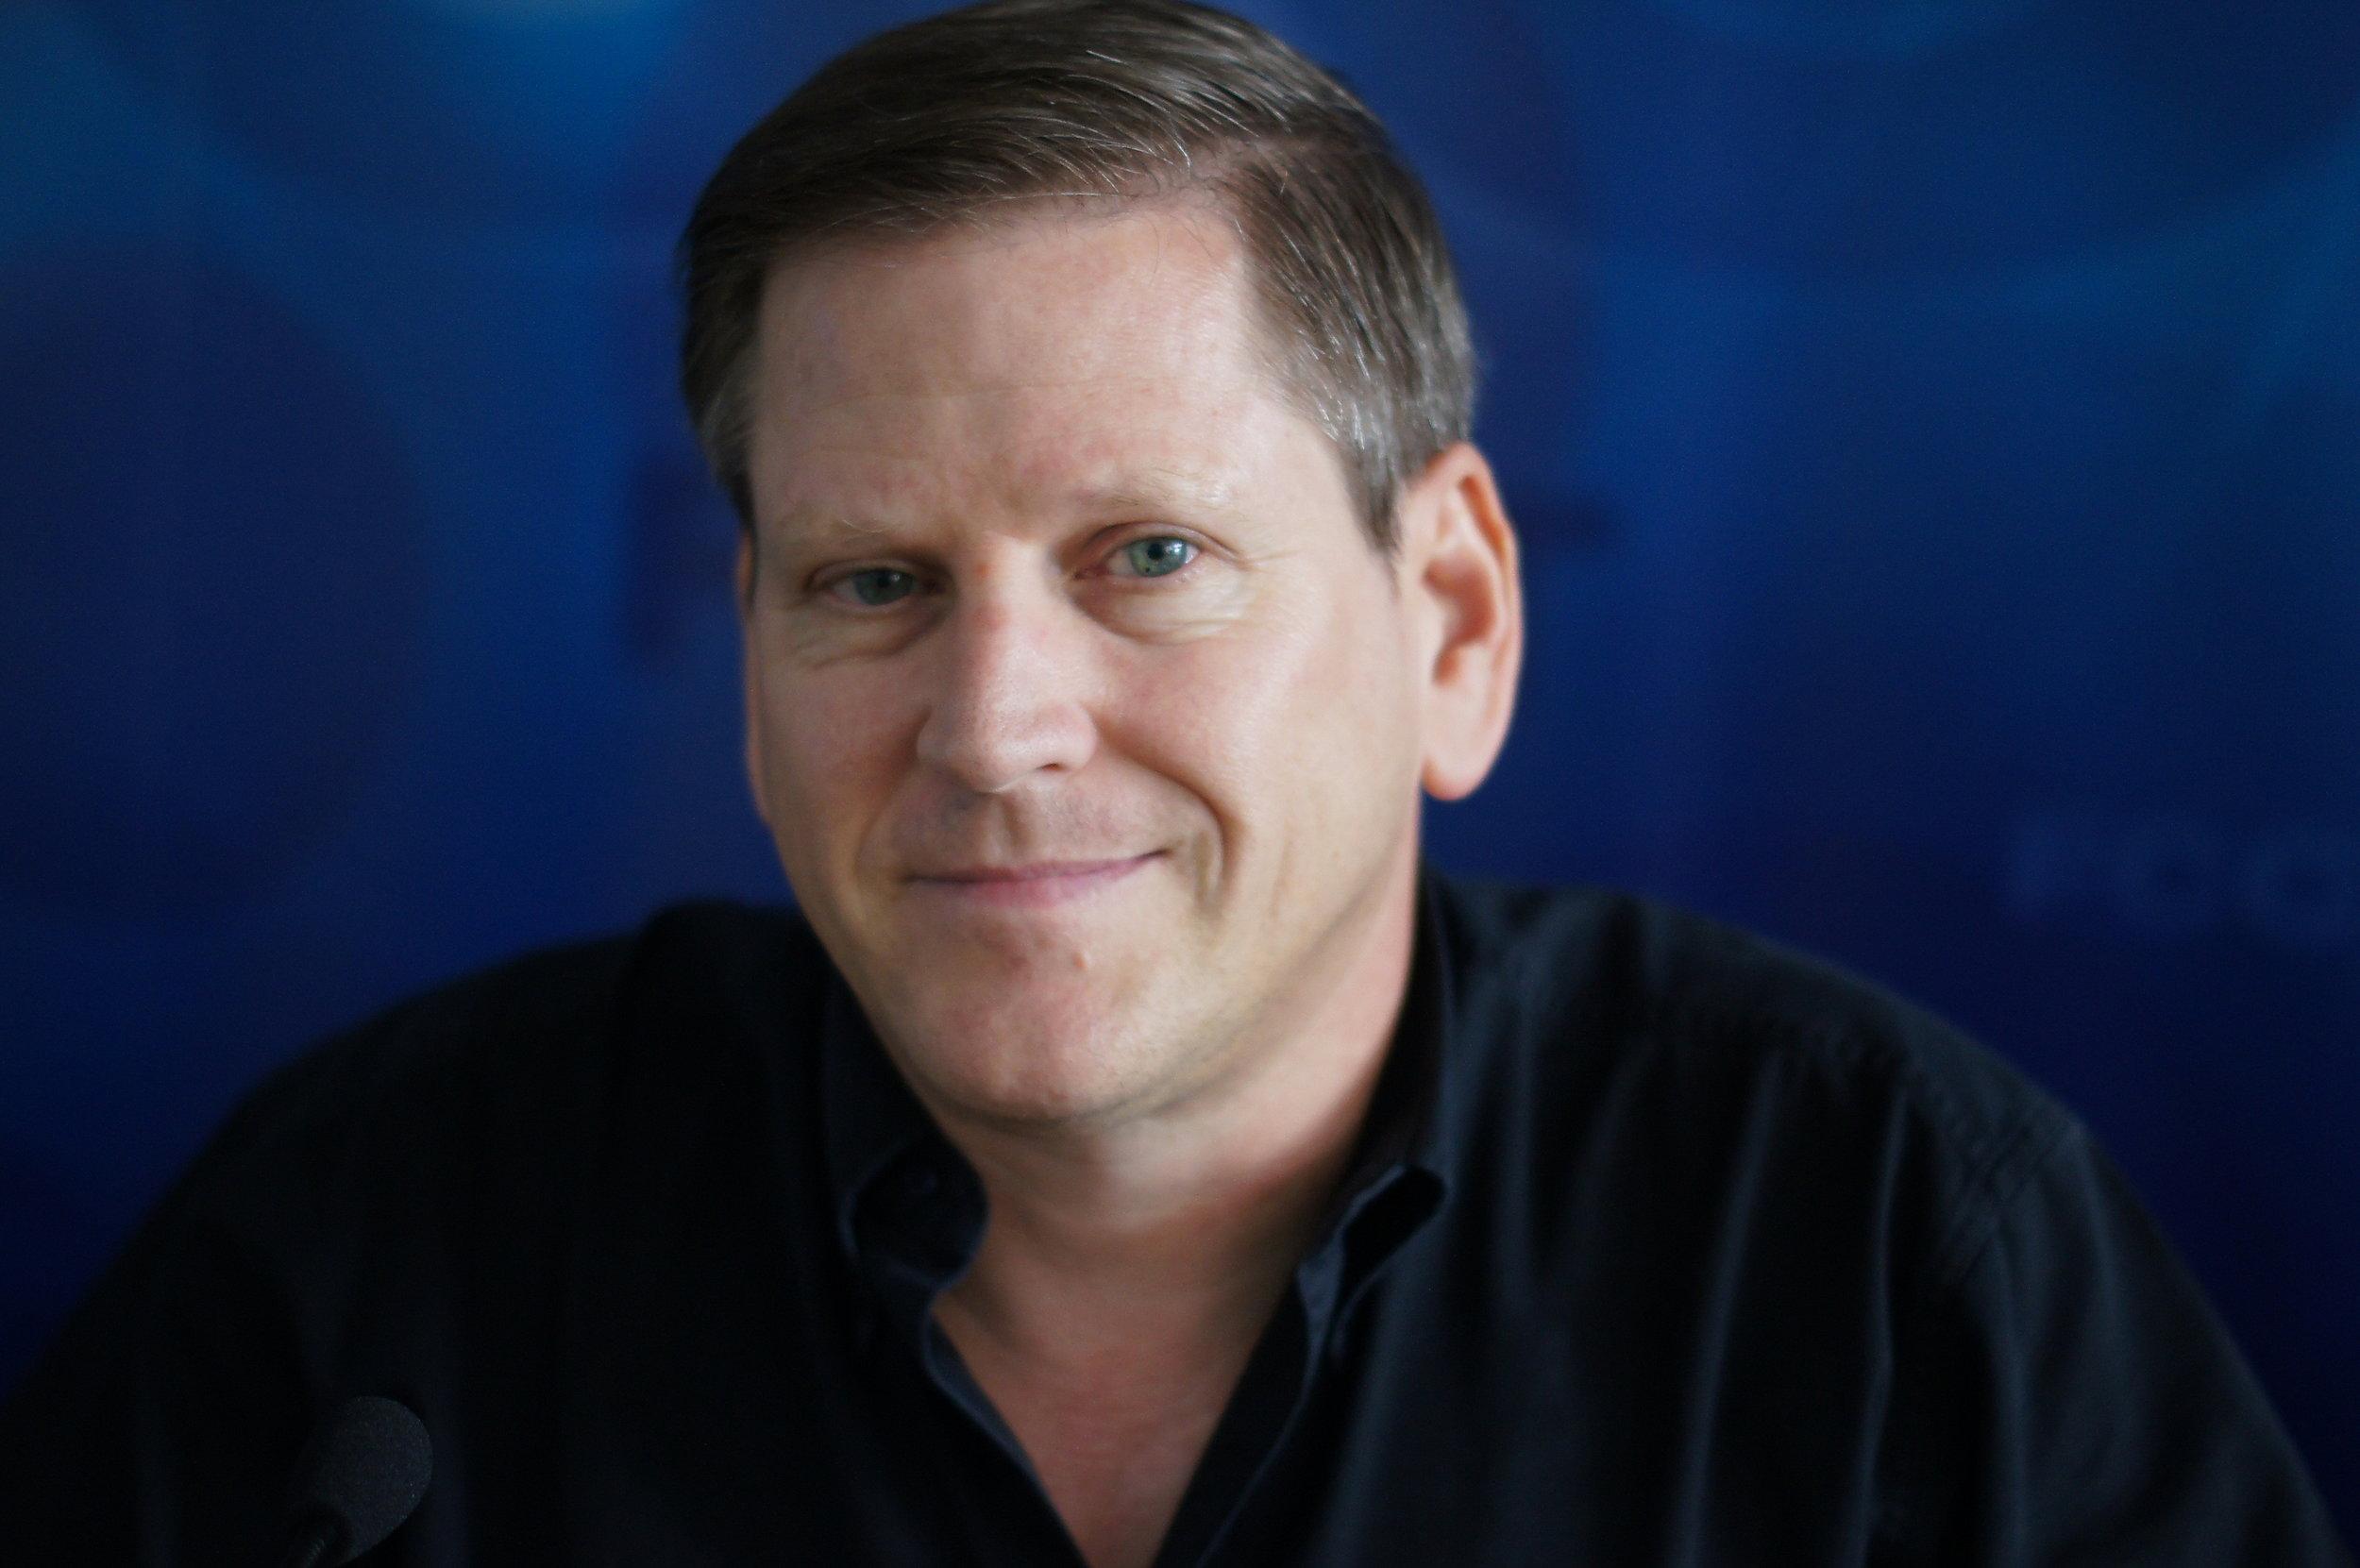 Phil Robertson HRW - Phil Robertson.JPG